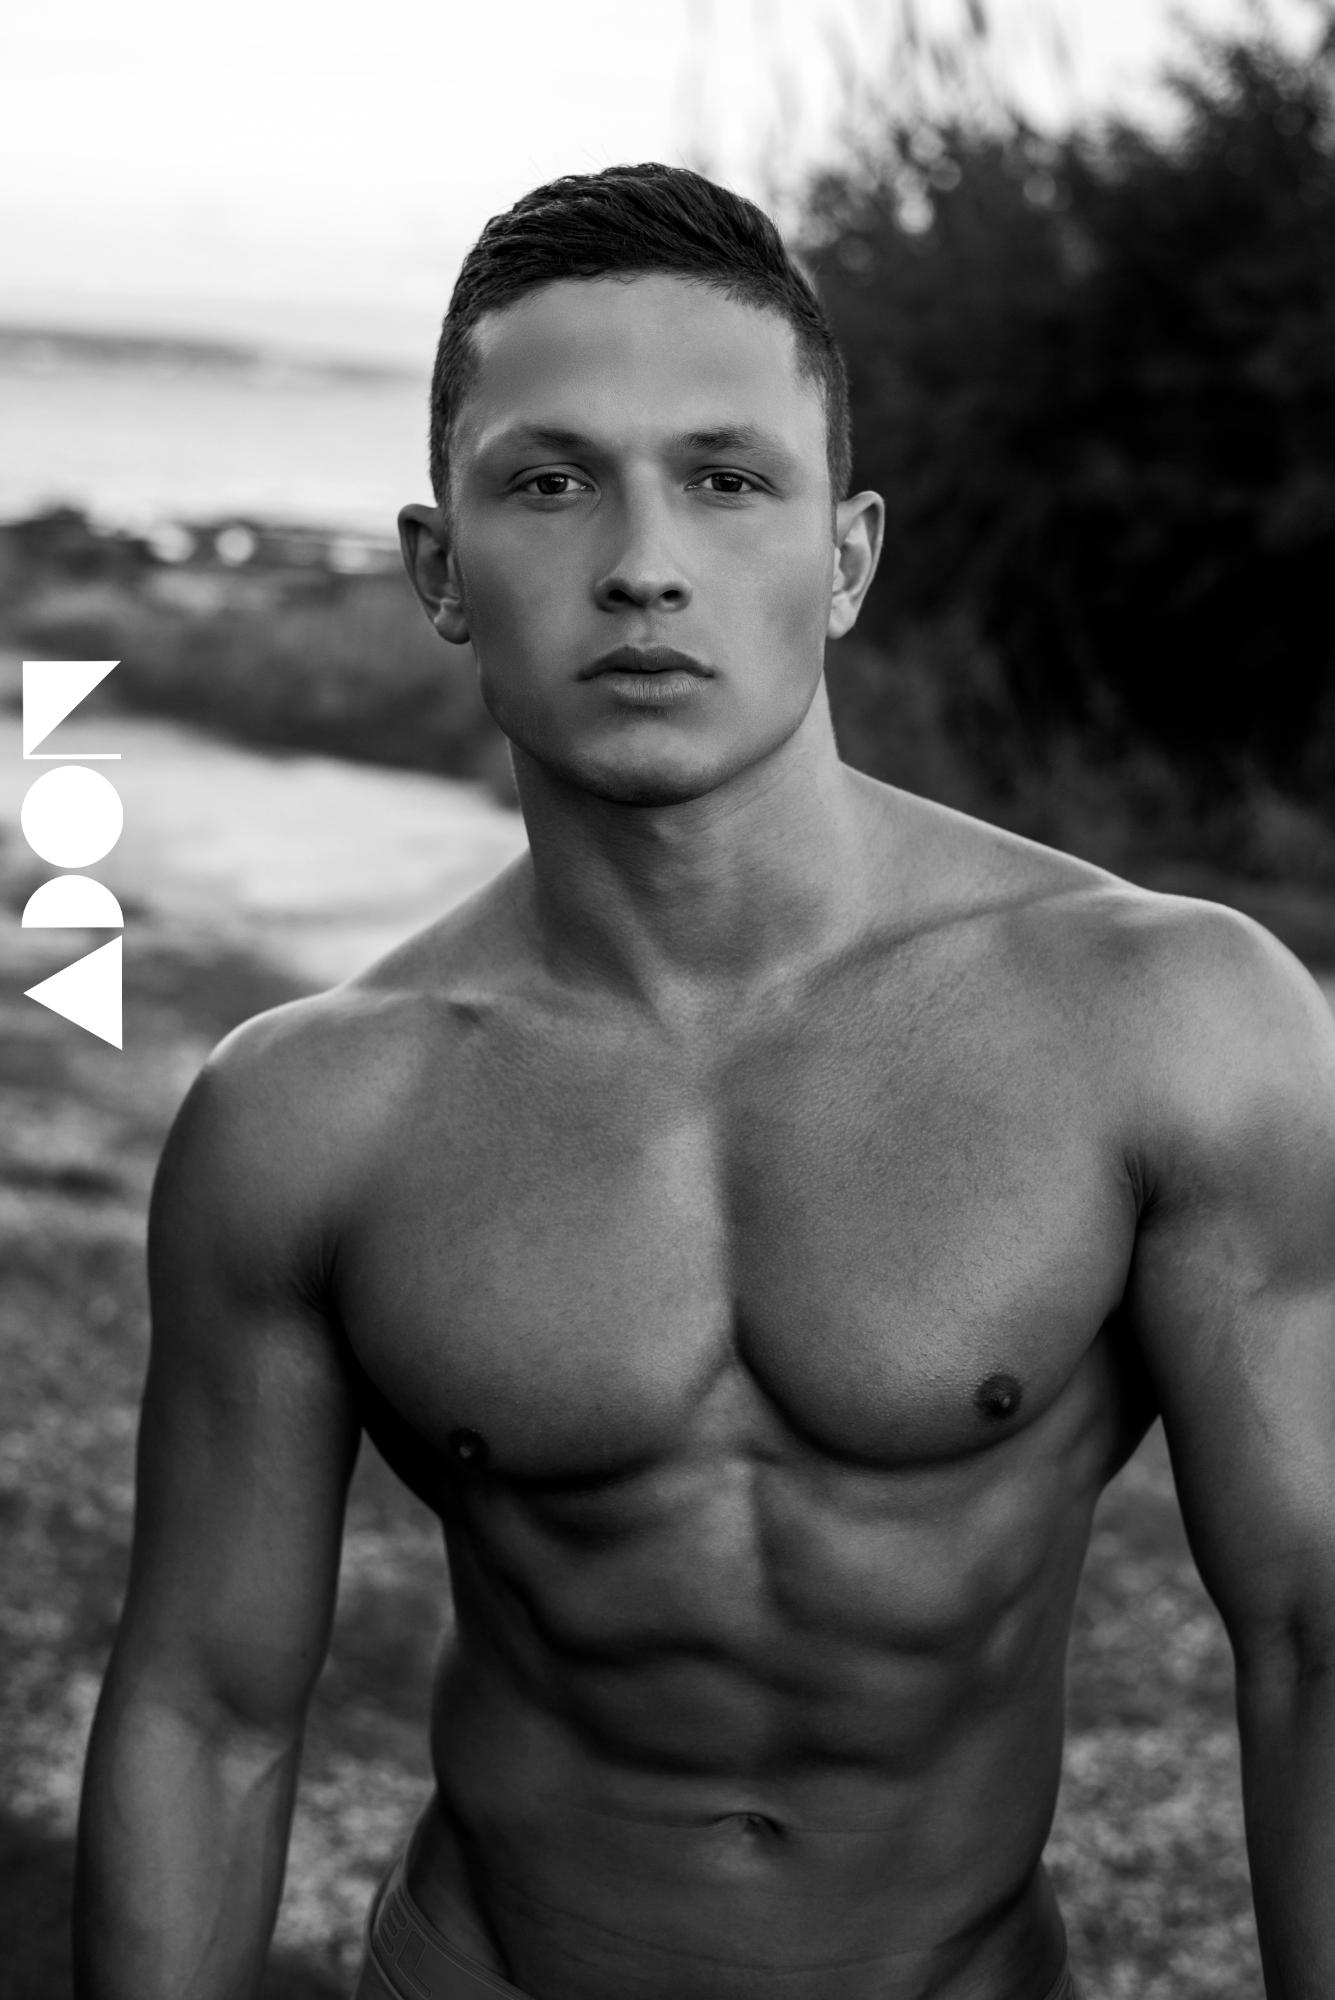 Adon Exclusive: Model Ruslan Efimov By Stavros Christodoulou